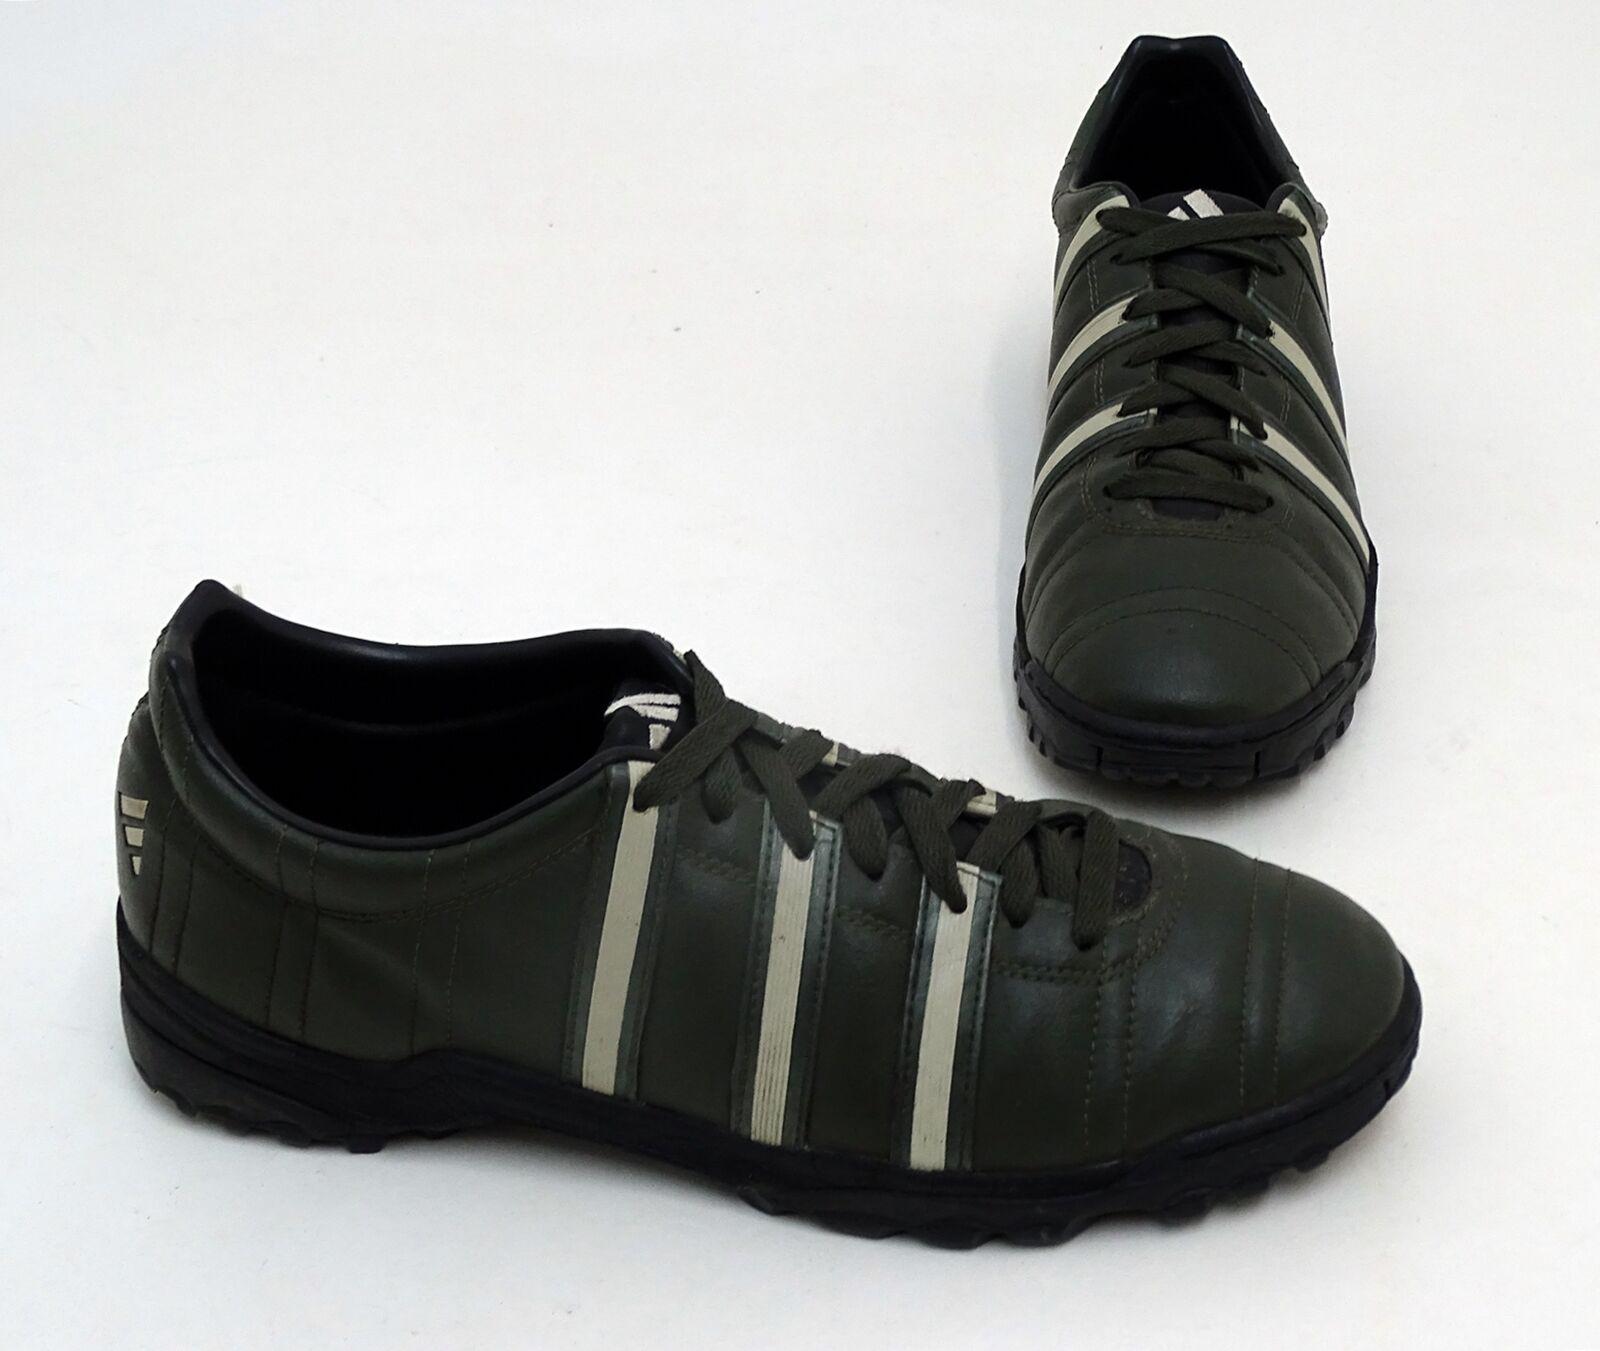 Adidas Turf Outdoor Fußballschuhe Synthetik olive Gr. 44